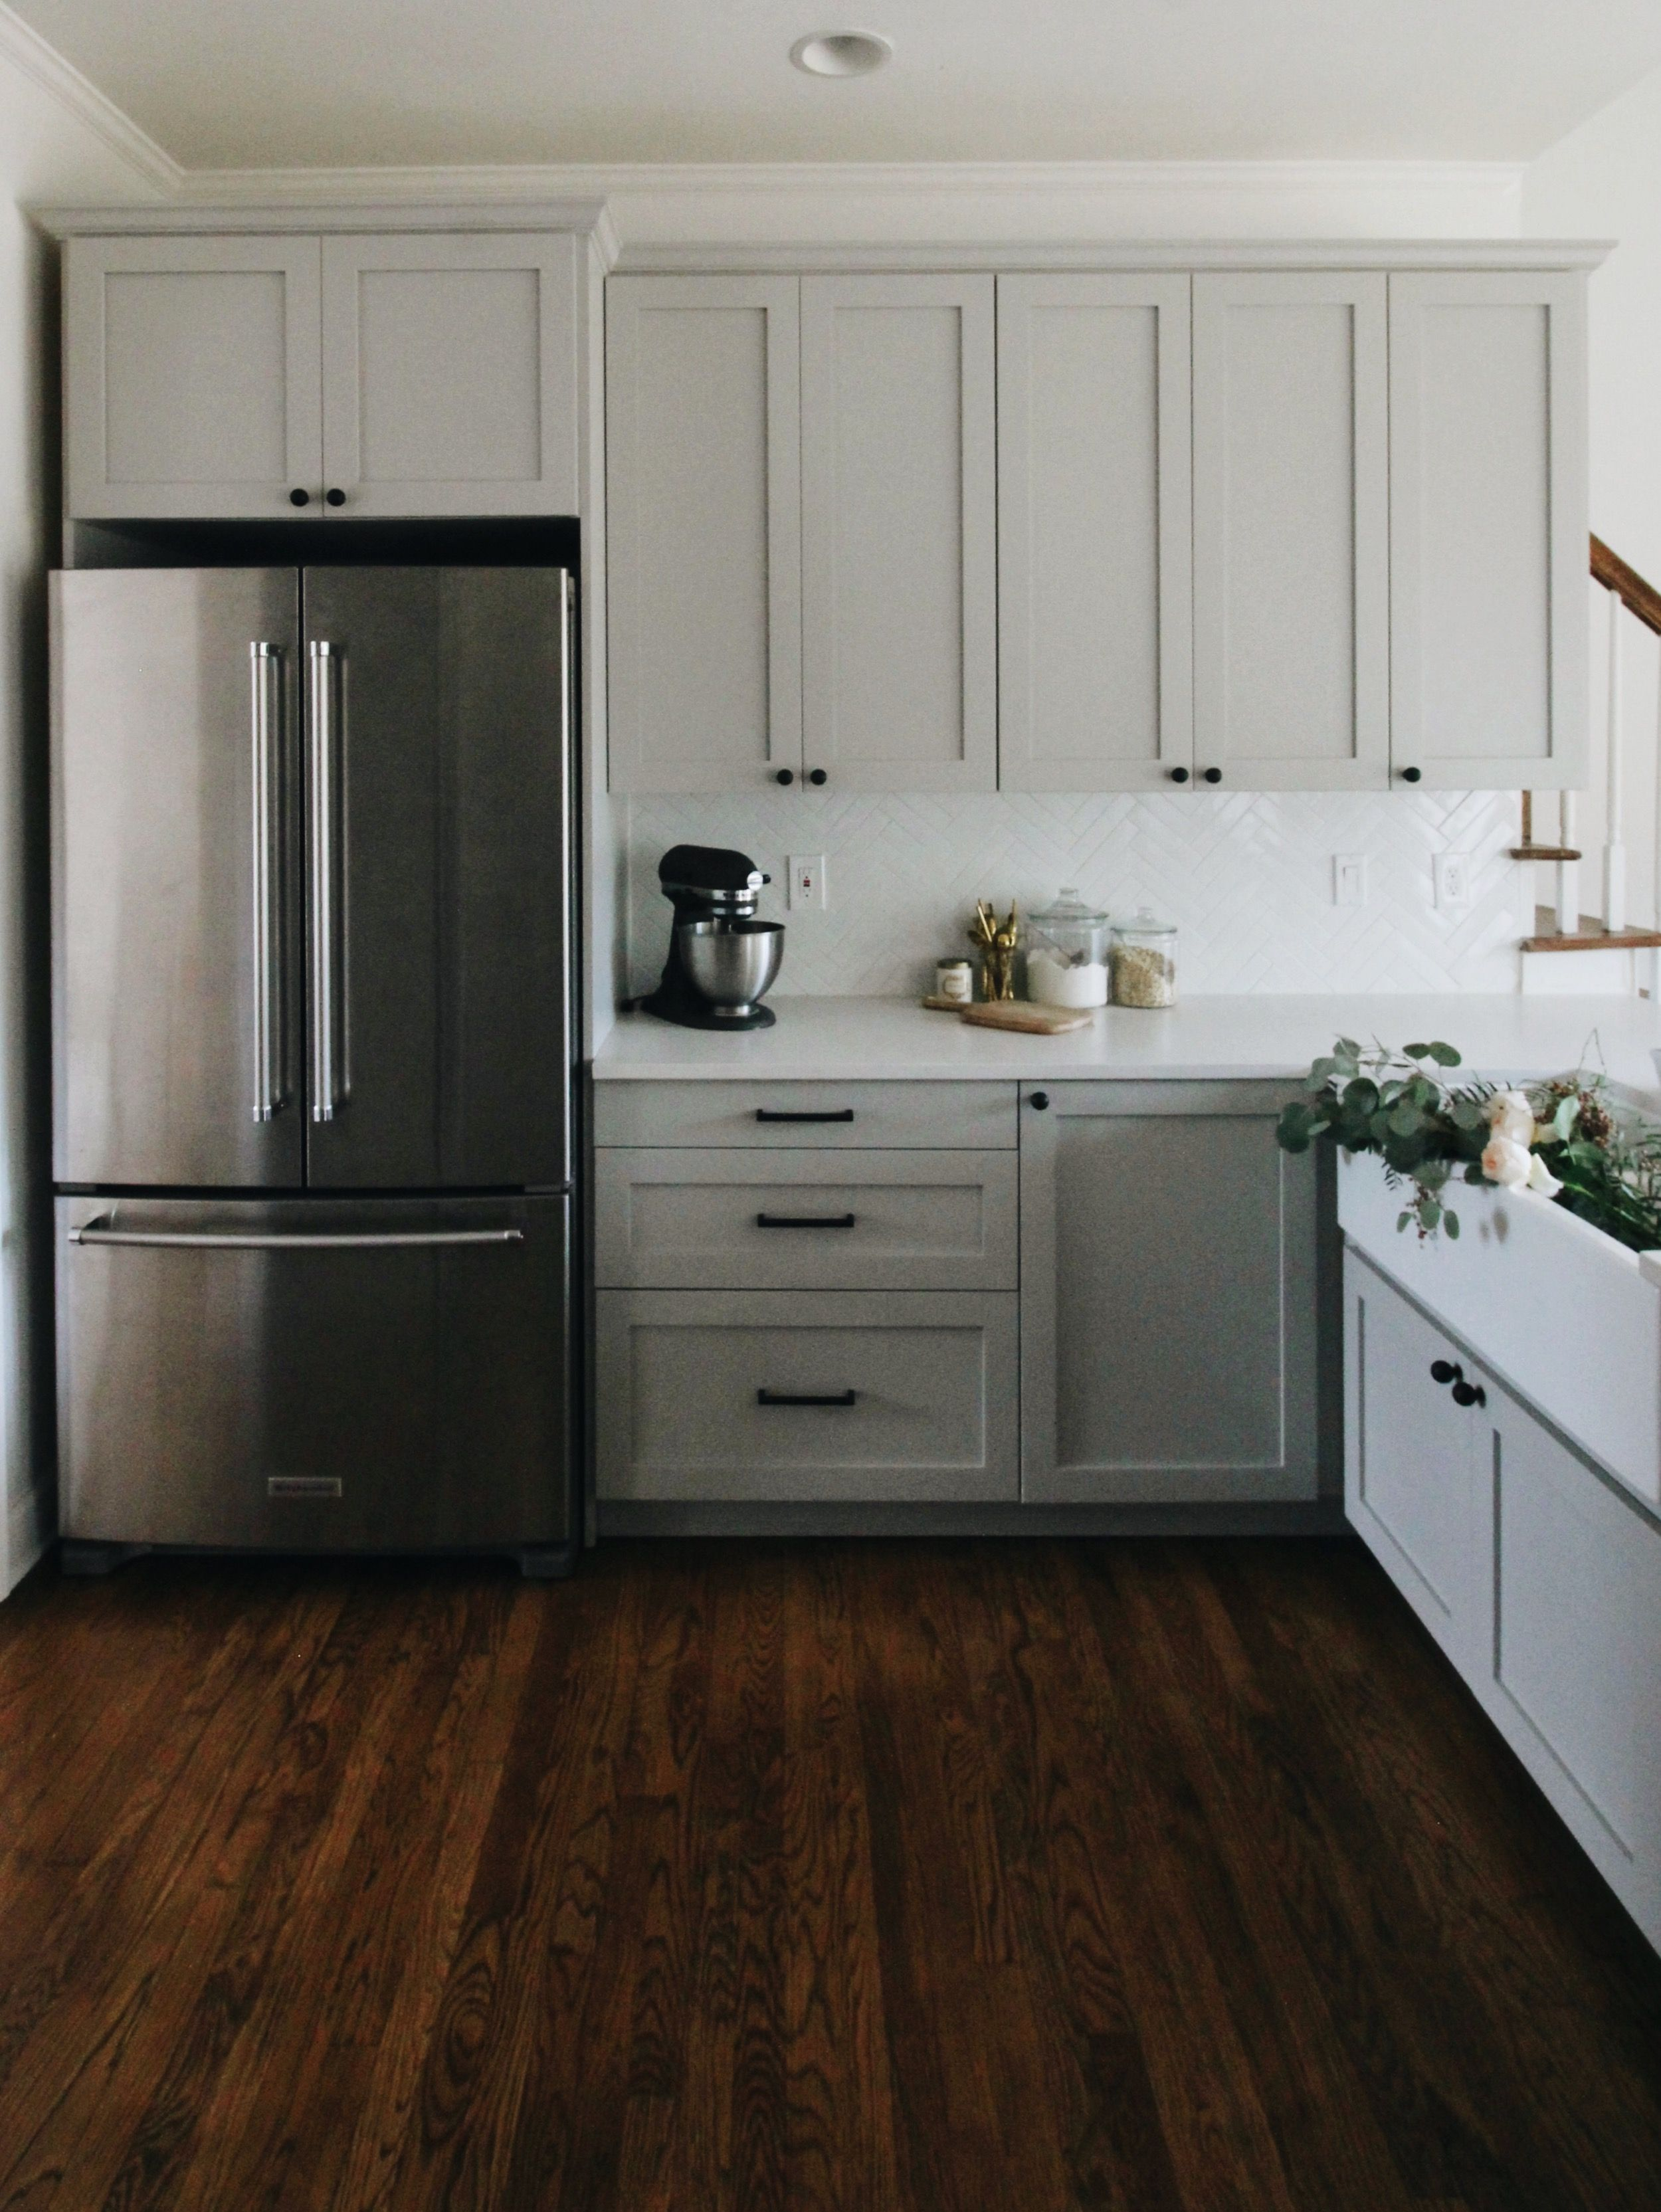 Our Kitchen Tour Garvinandco Com Minimalist Kitchen Cabinets